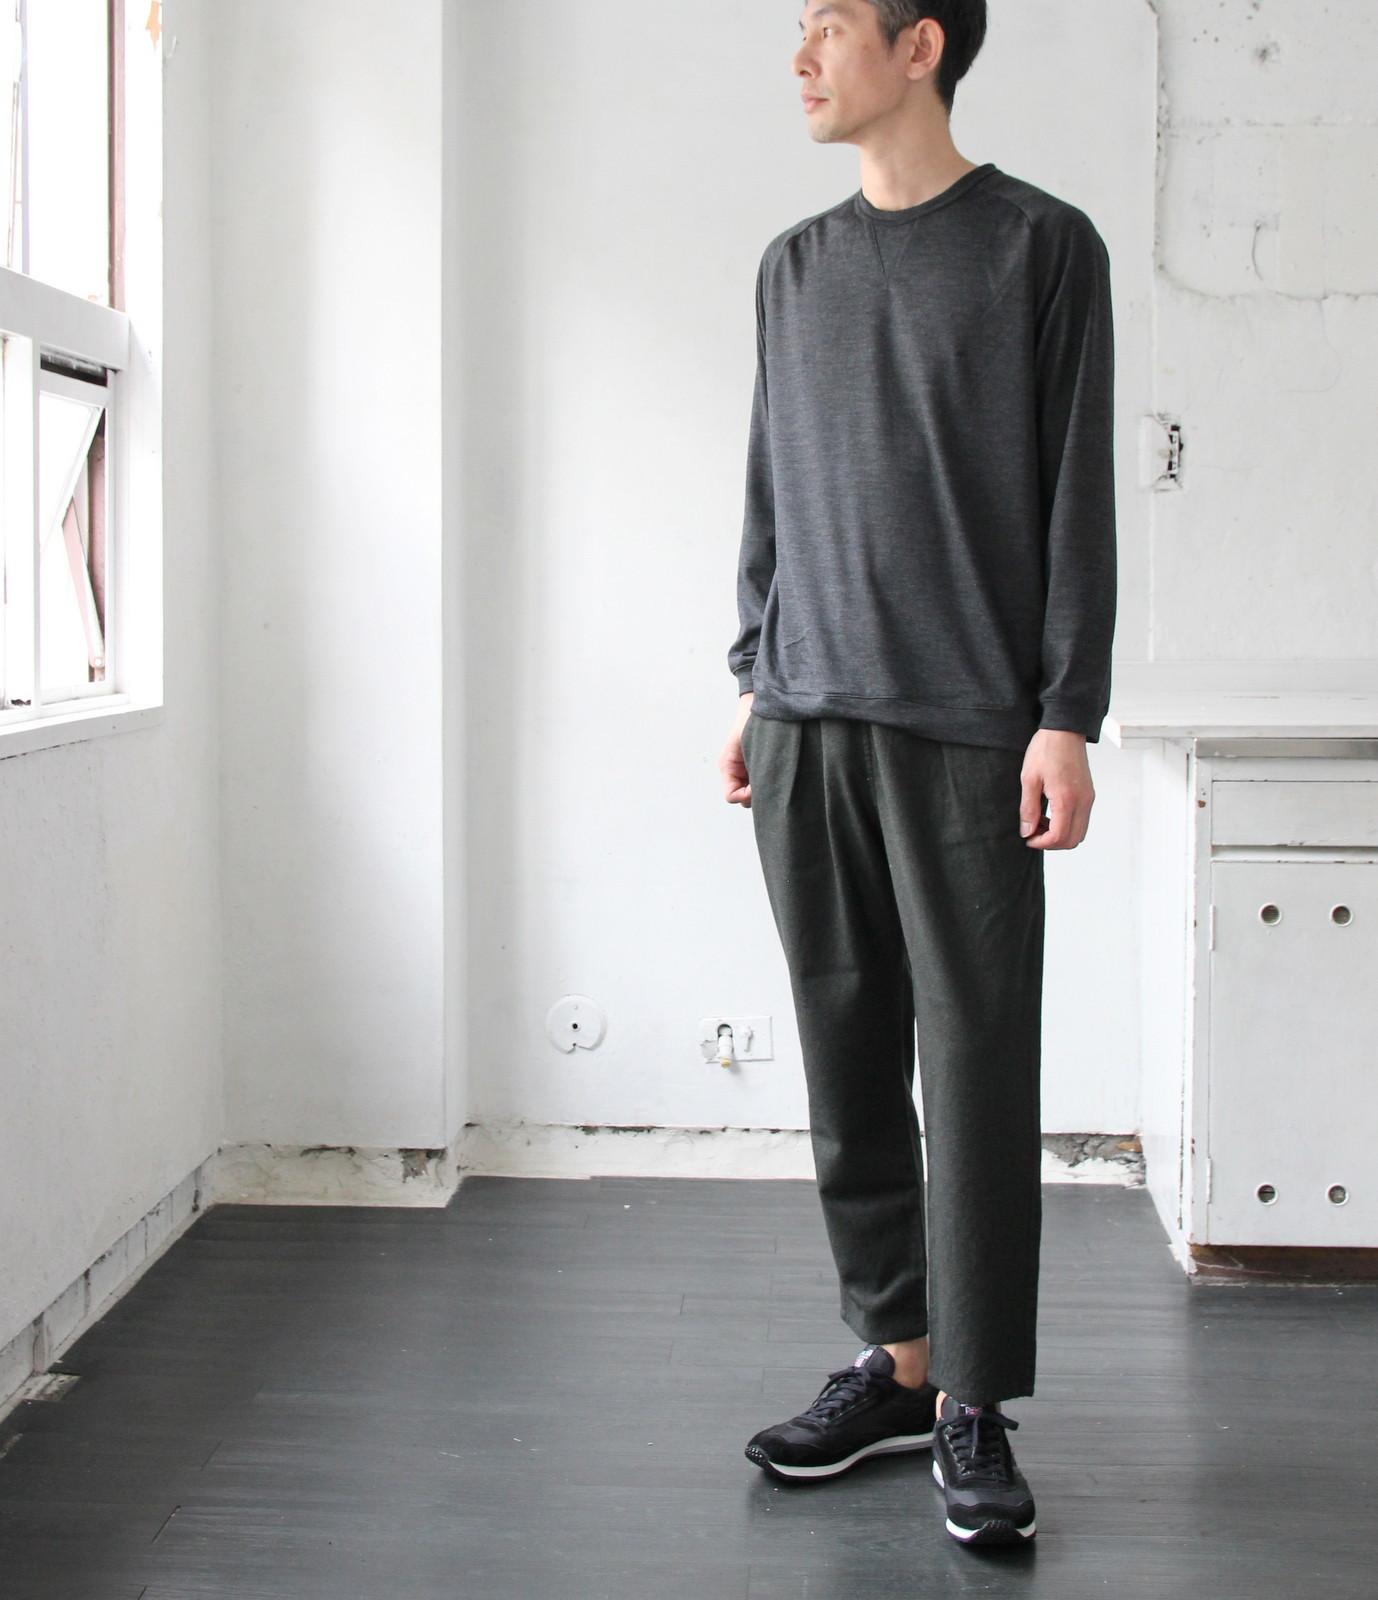 Merino Wool Knit Crew Neck_c0379477_20415815.jpg